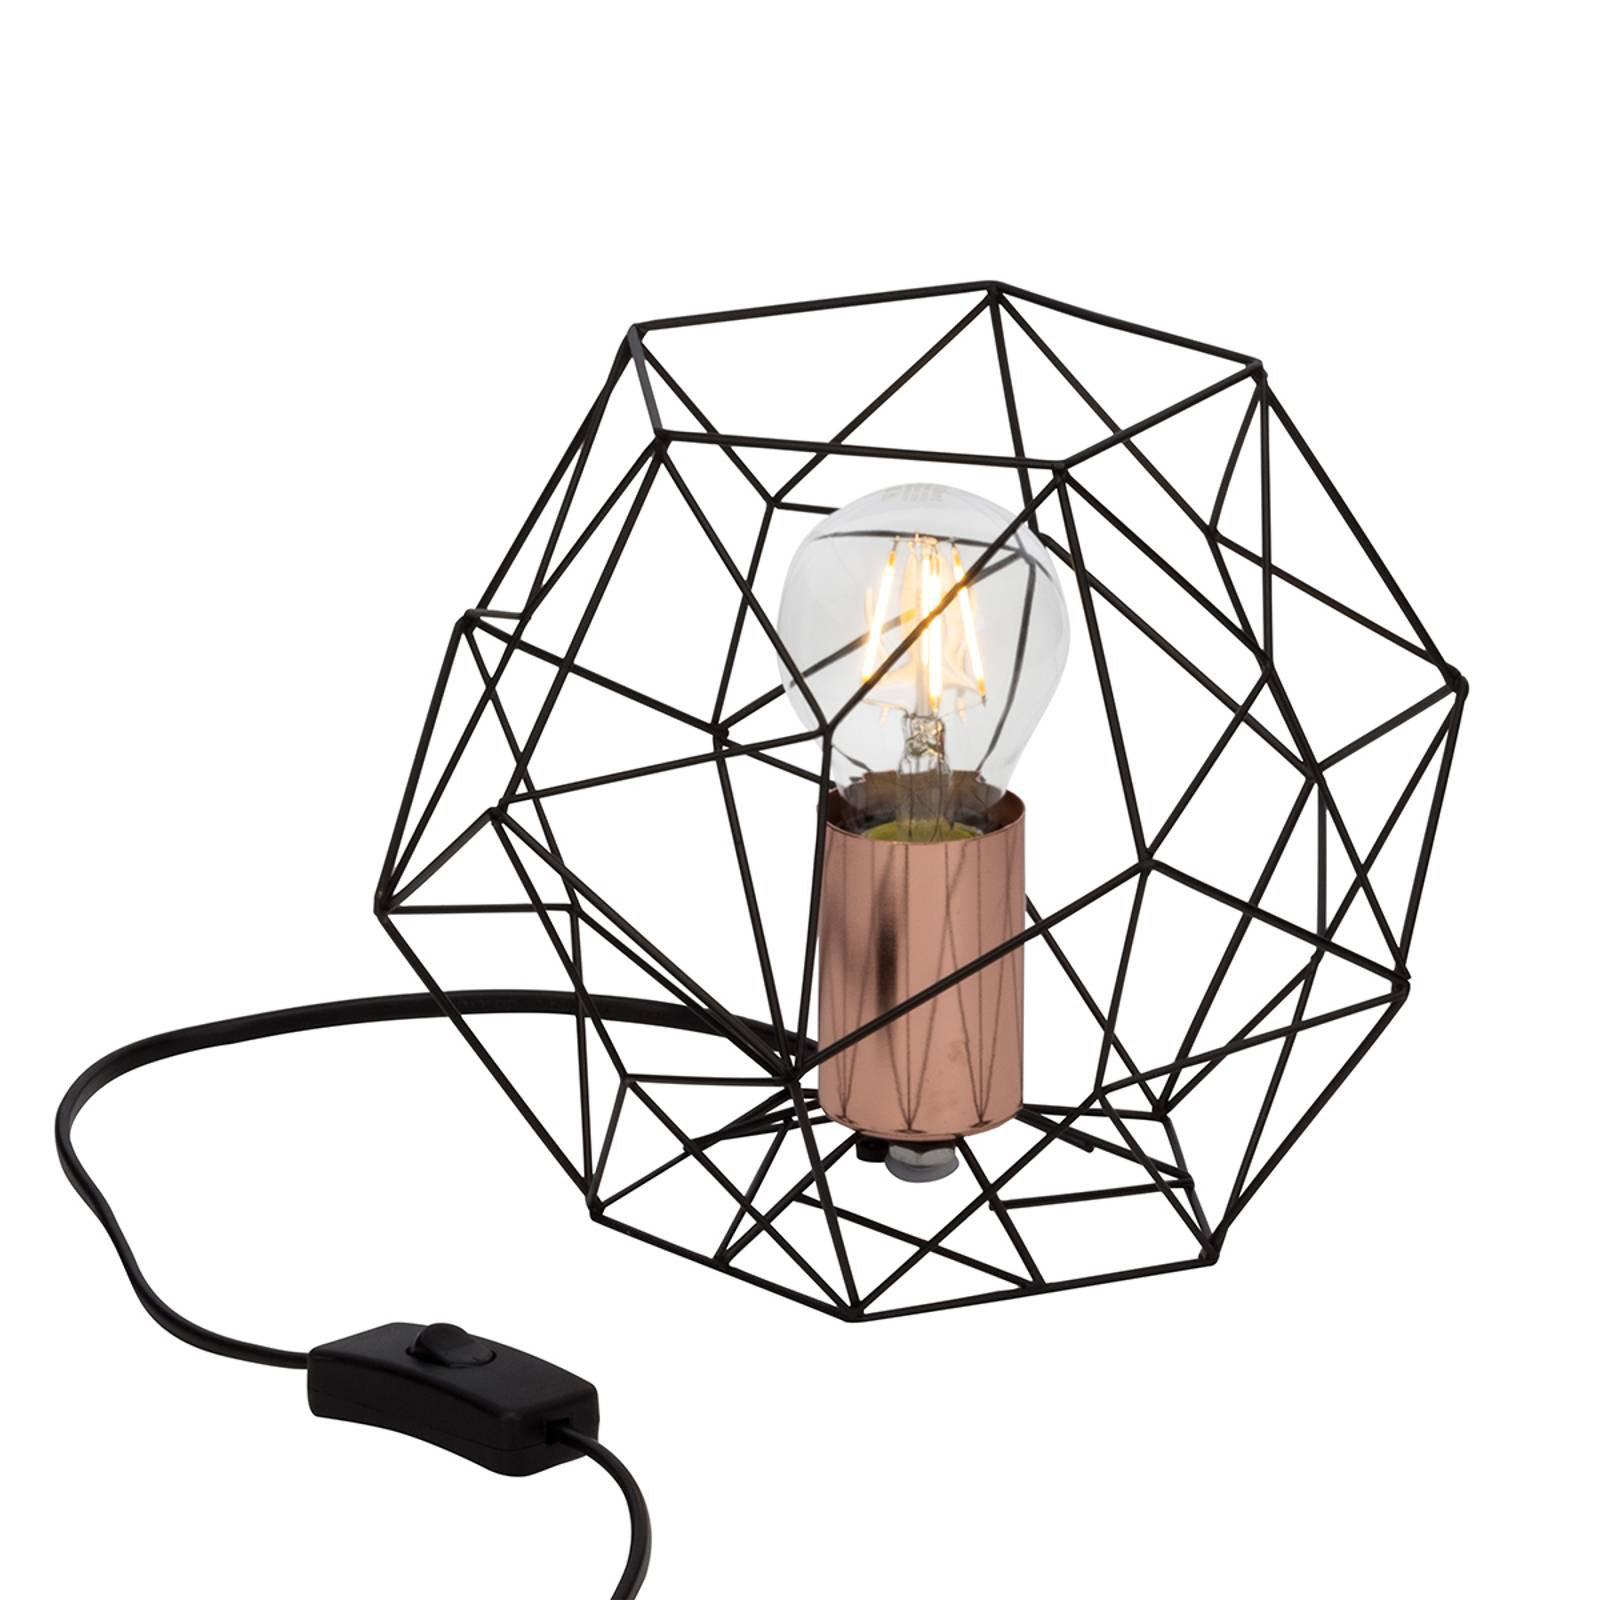 Synergi - interessant utformet bordlampe